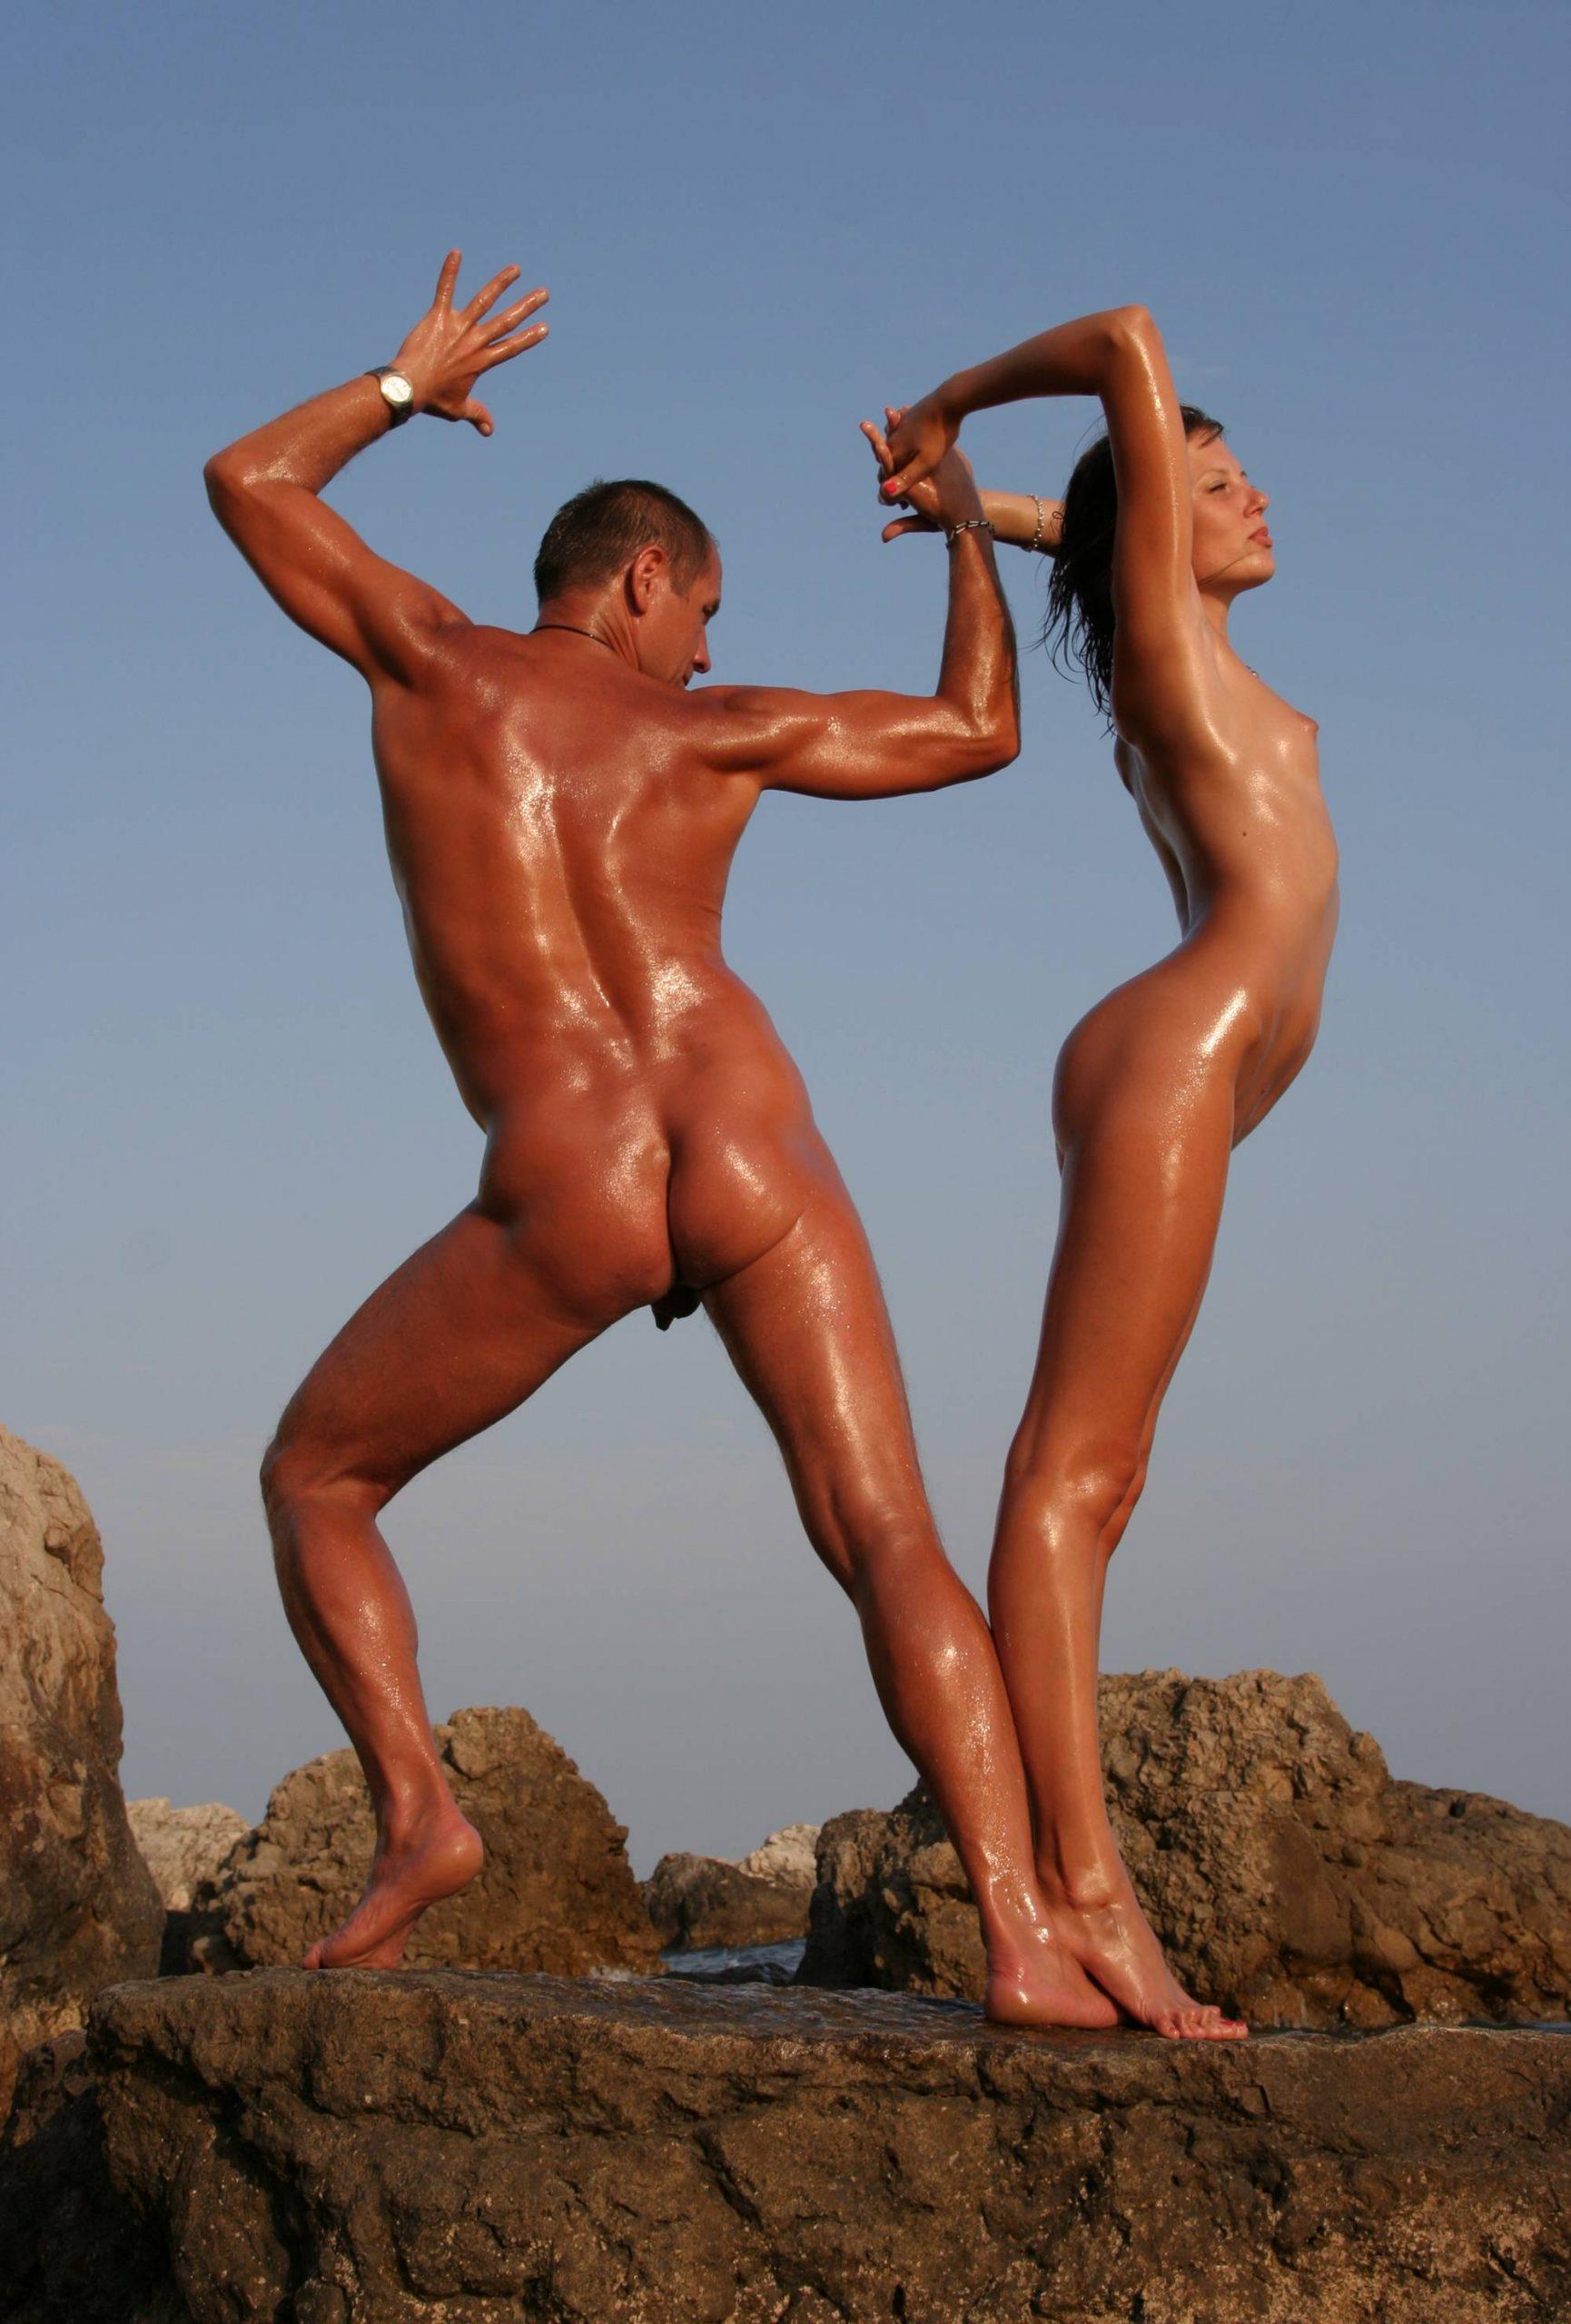 Nudist Couples Dynamics - 3